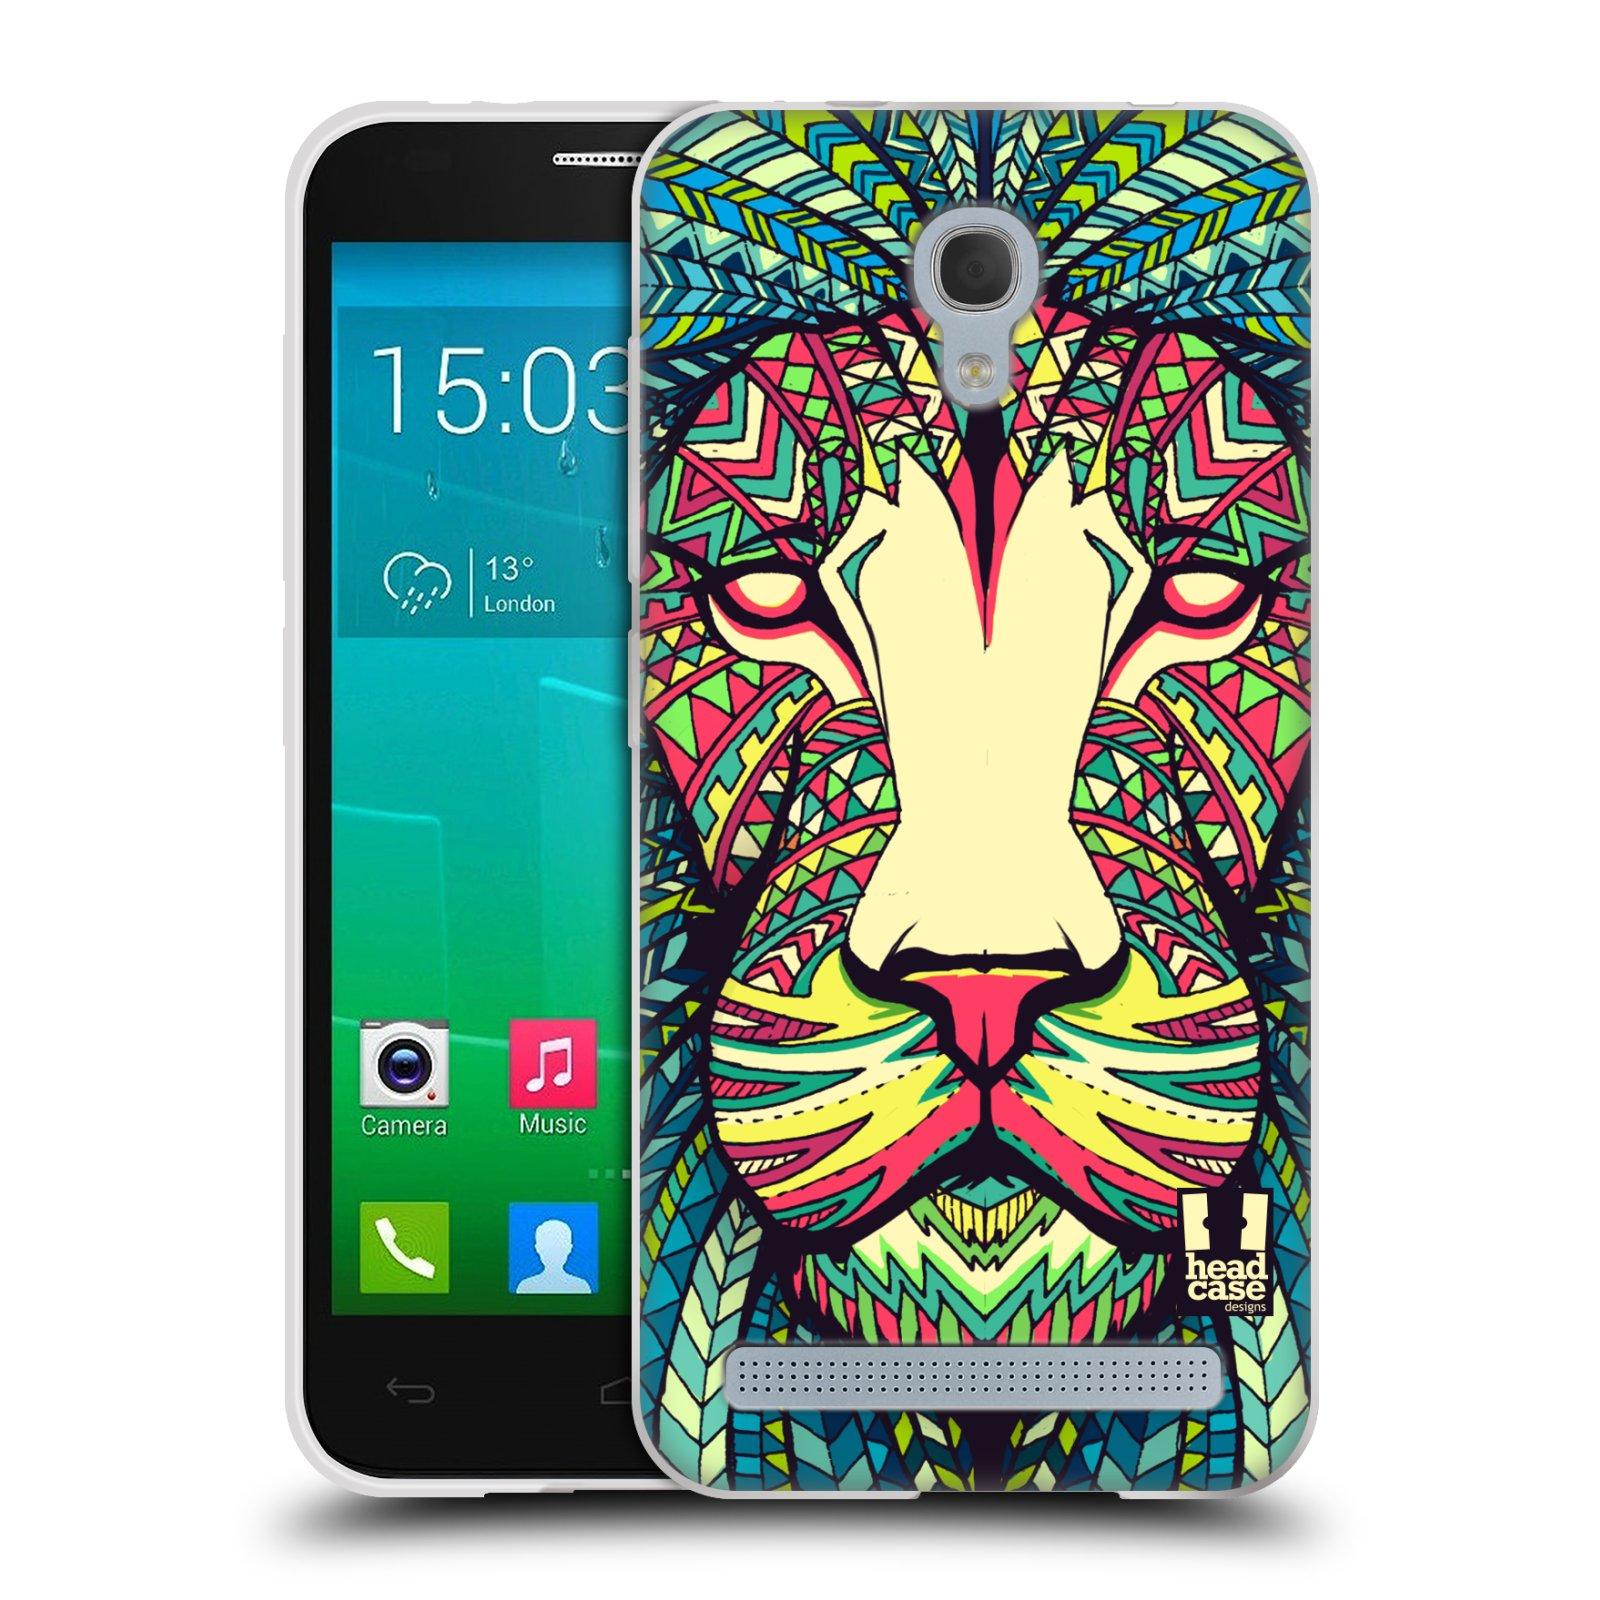 Silikonové pouzdro na mobil Alcatel One Touch Idol 2 Mini S 6036Y HEAD CASE AZTEC LEV (Silikonový kryt či obal na mobilní telefon Alcatel Idol 2 Mini S OT-6036Y)